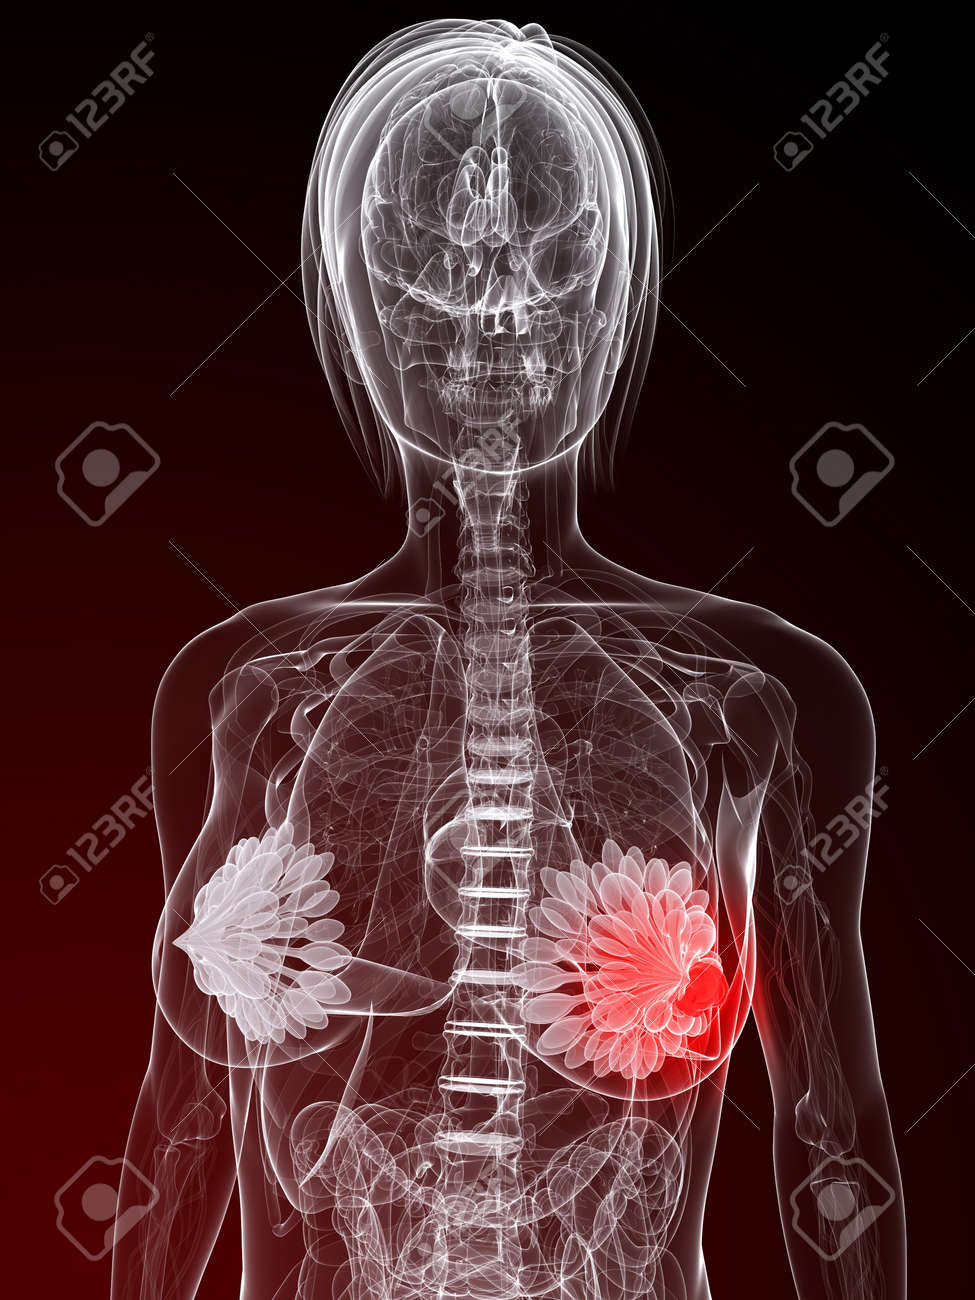 female anatomy with tumor in breast Stock Photo - 7248758